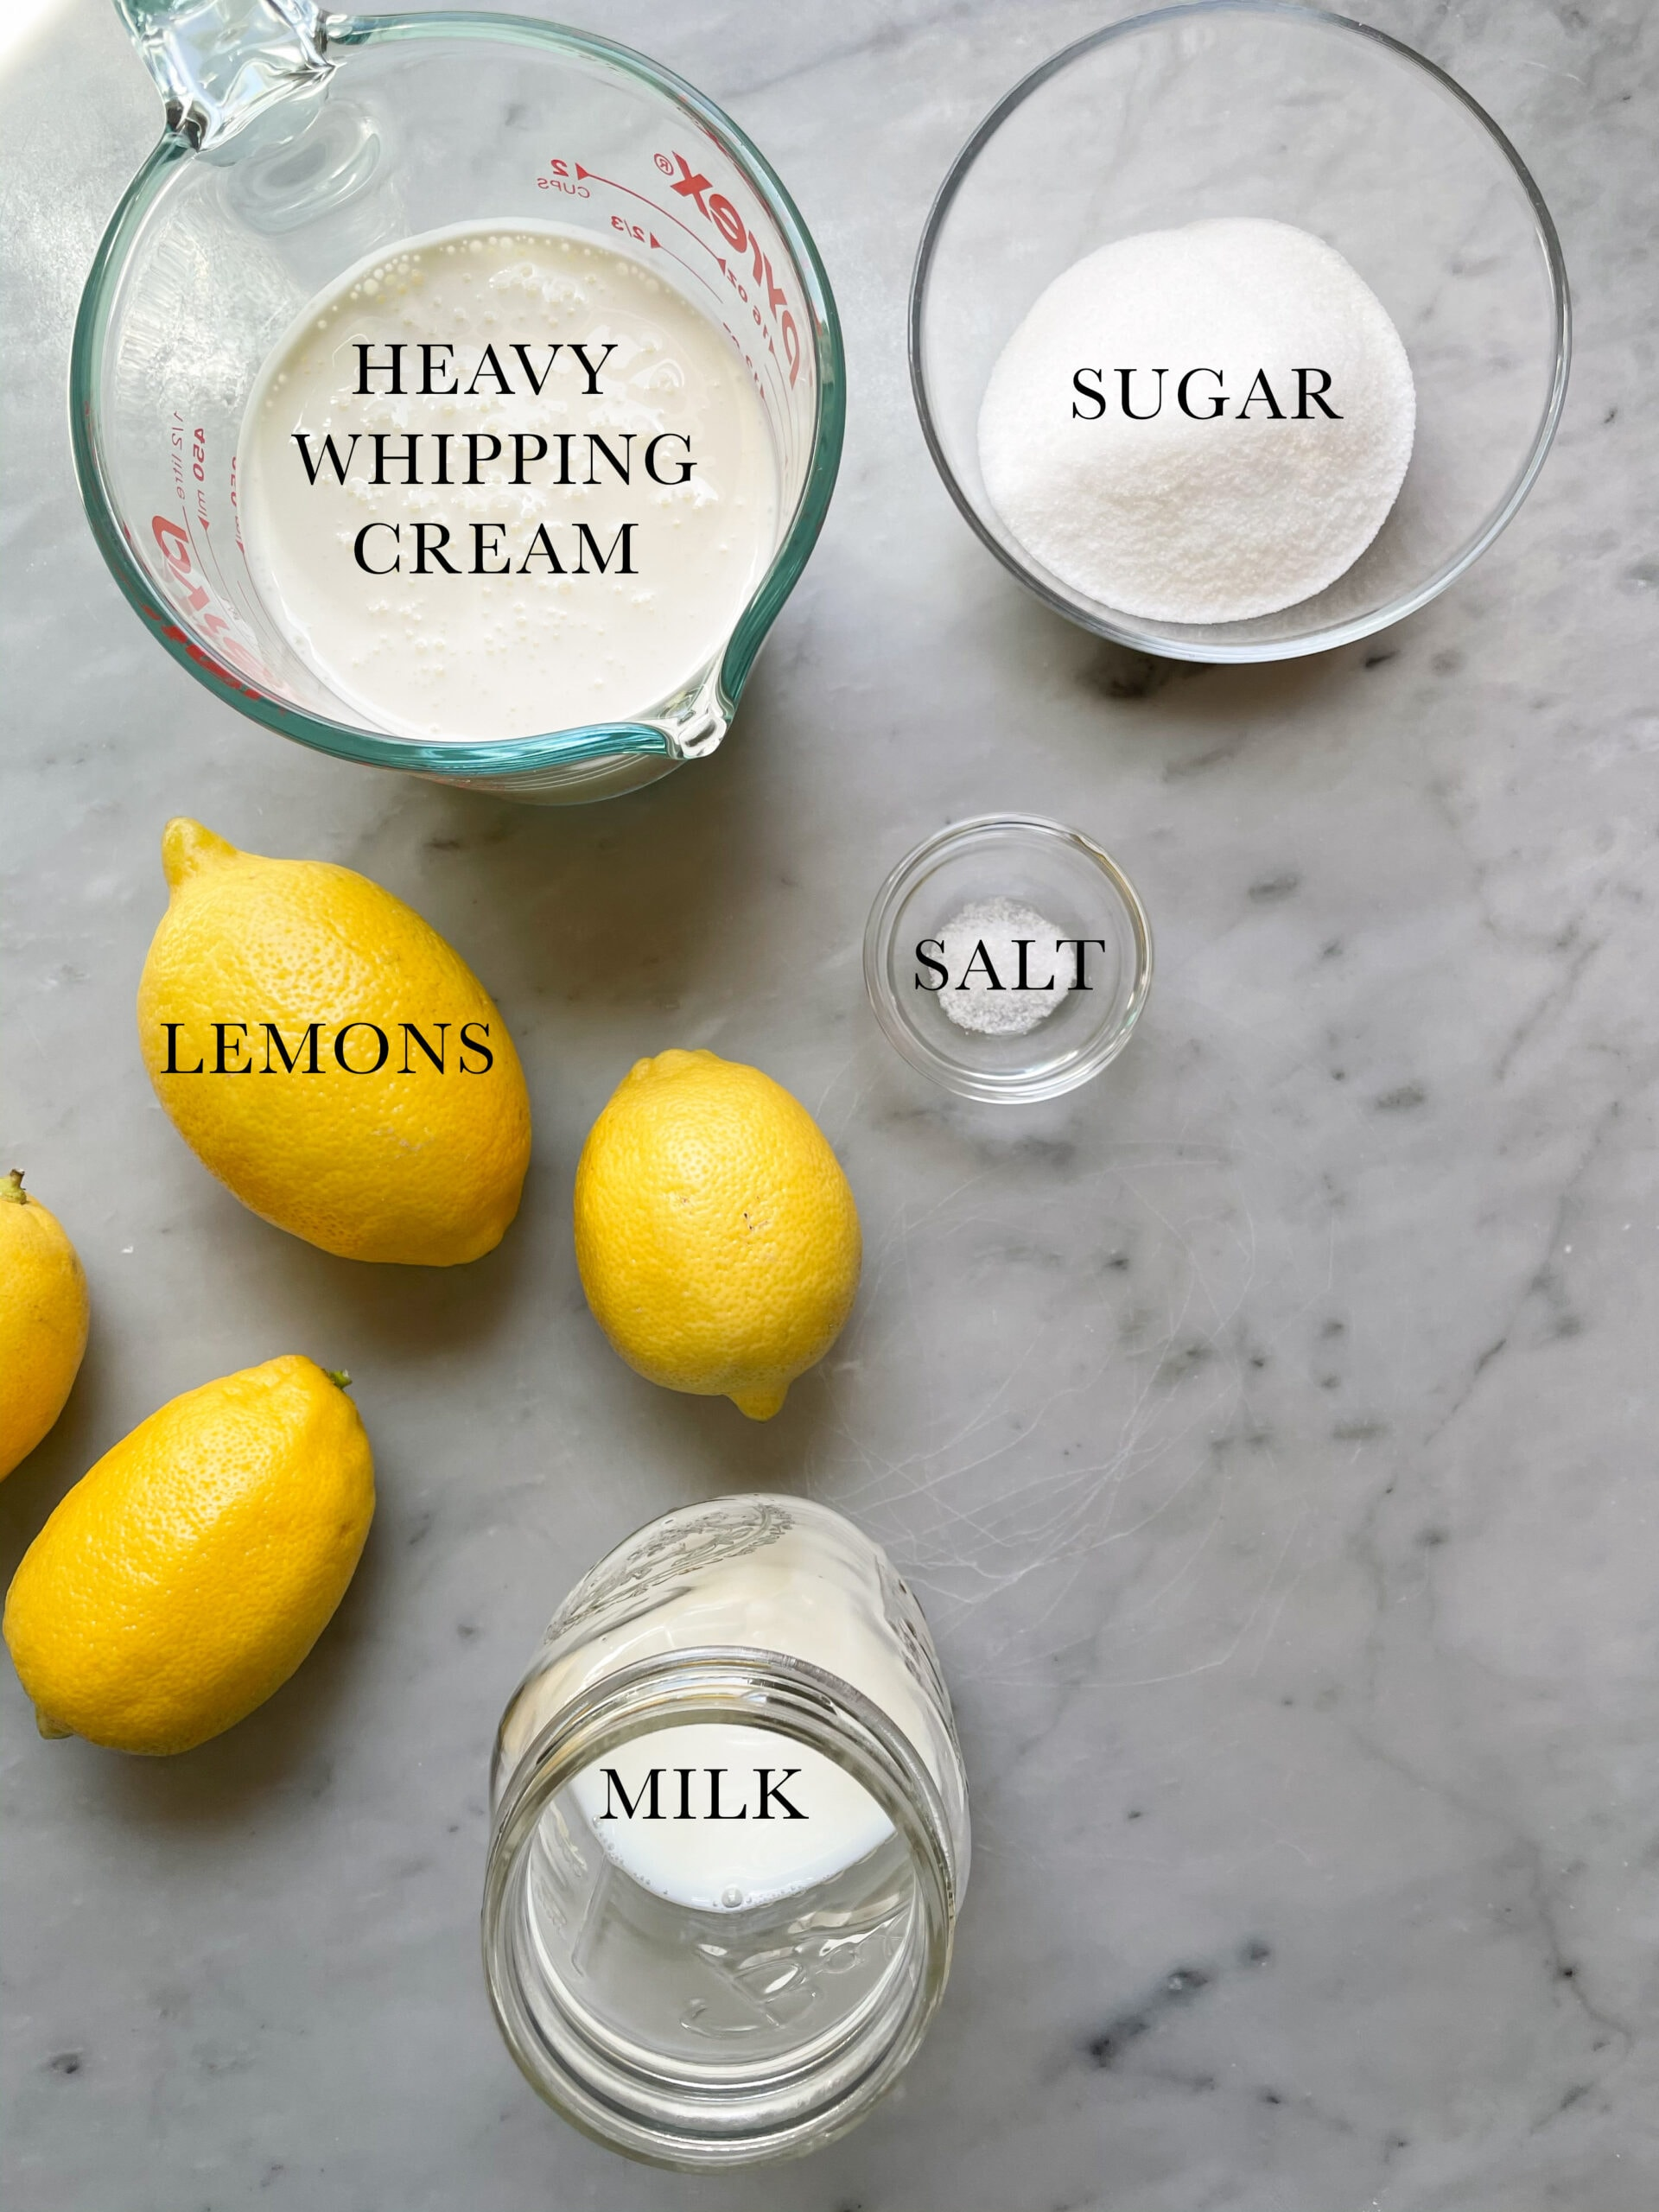 Ingredients for the No Churn Zitronen Eis.